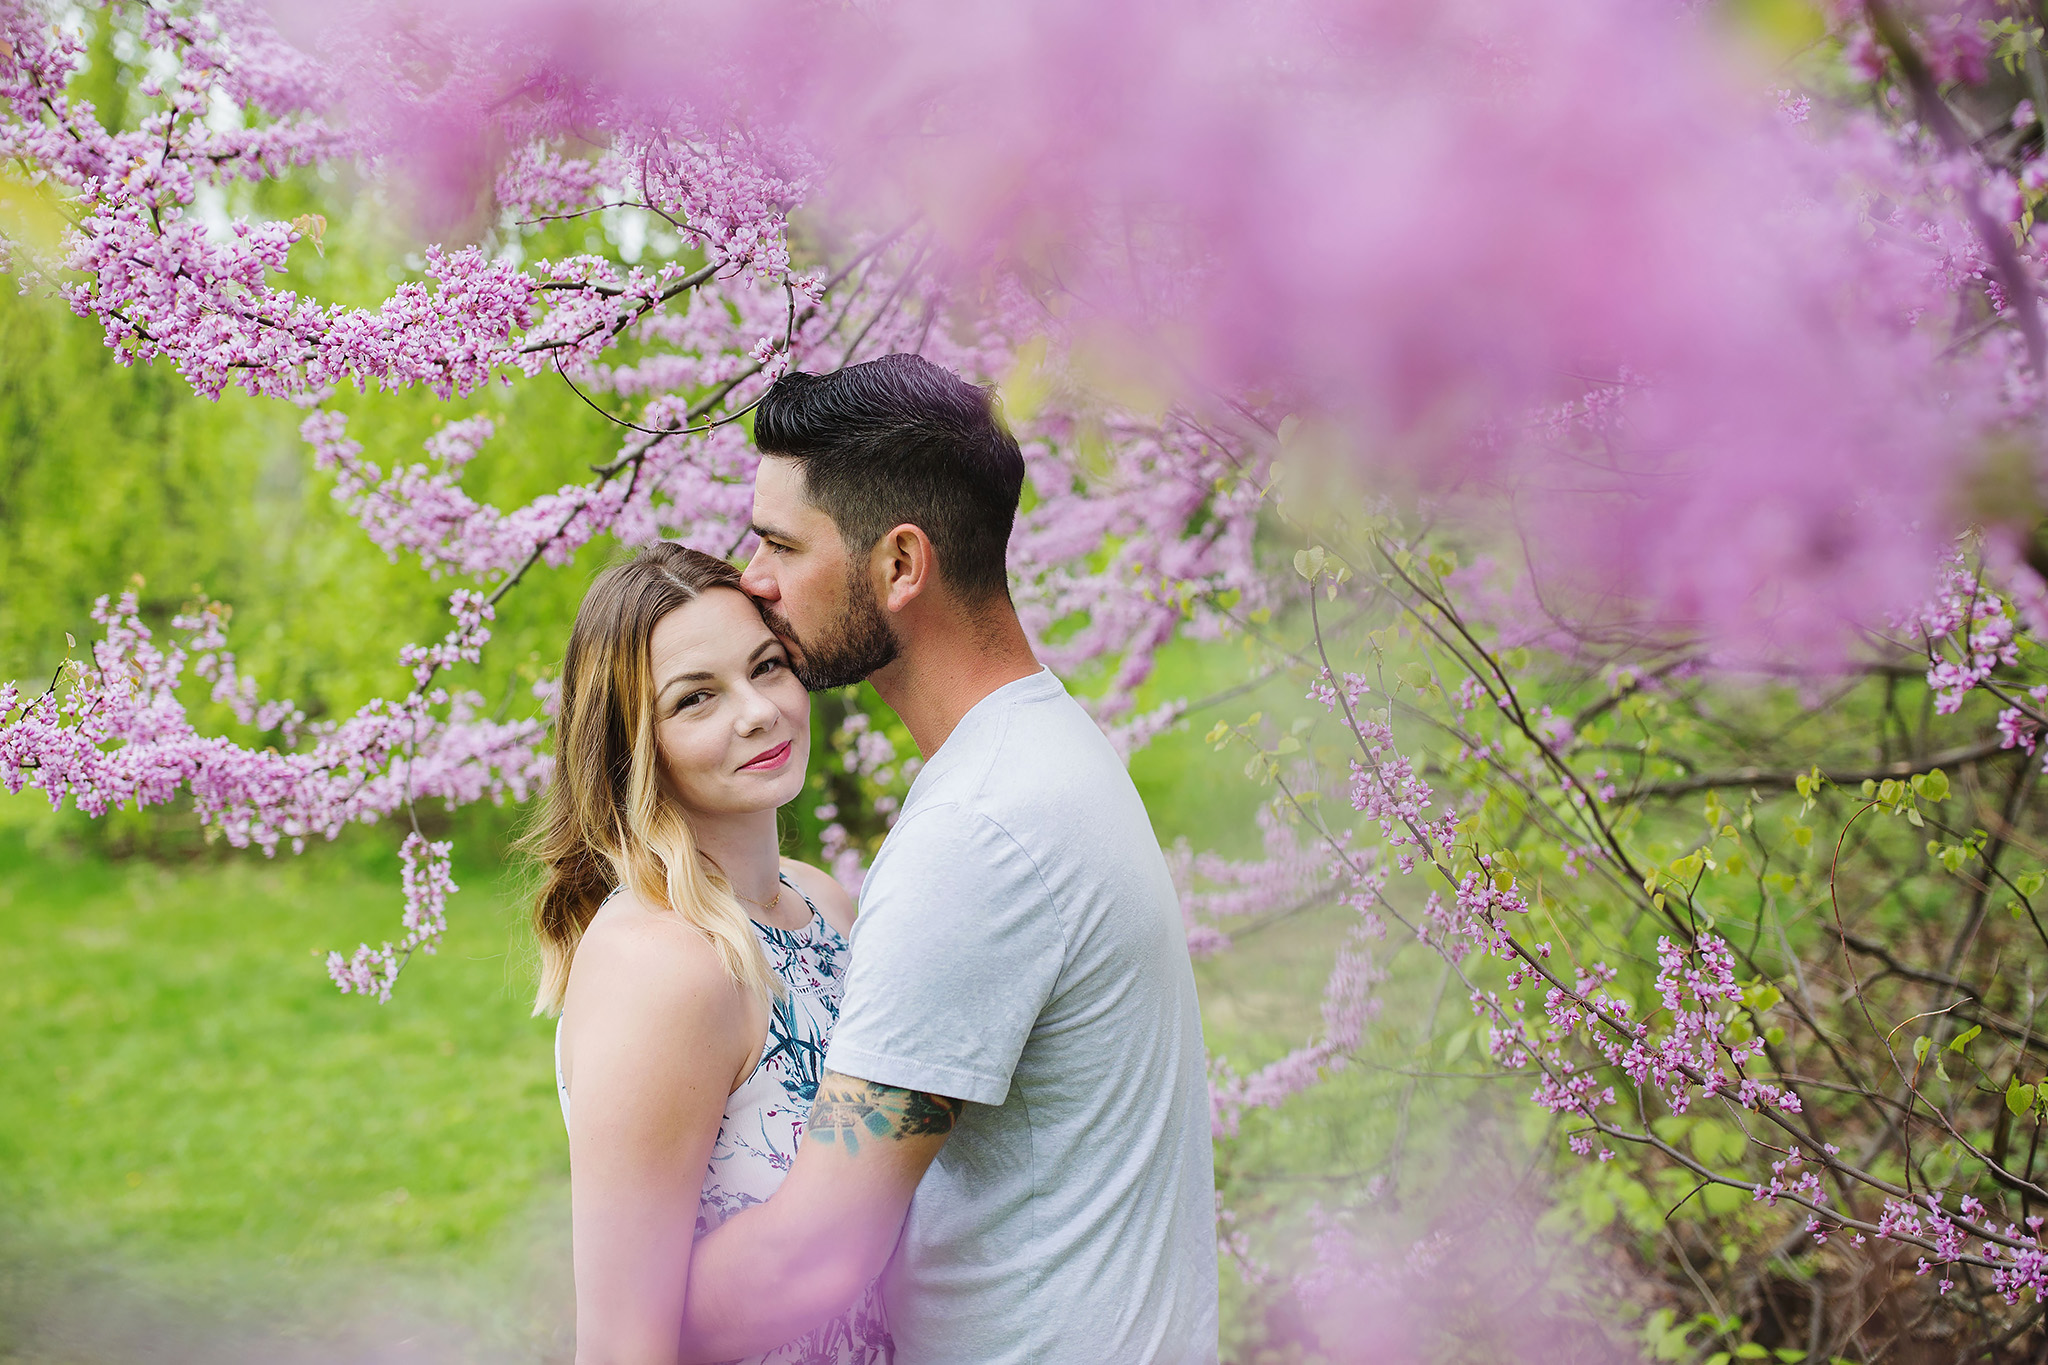 london_ontario_family_photographer-raw_footage_photography-spring_blossom_mini_sessions-magnolia-springbank_park025.jpg